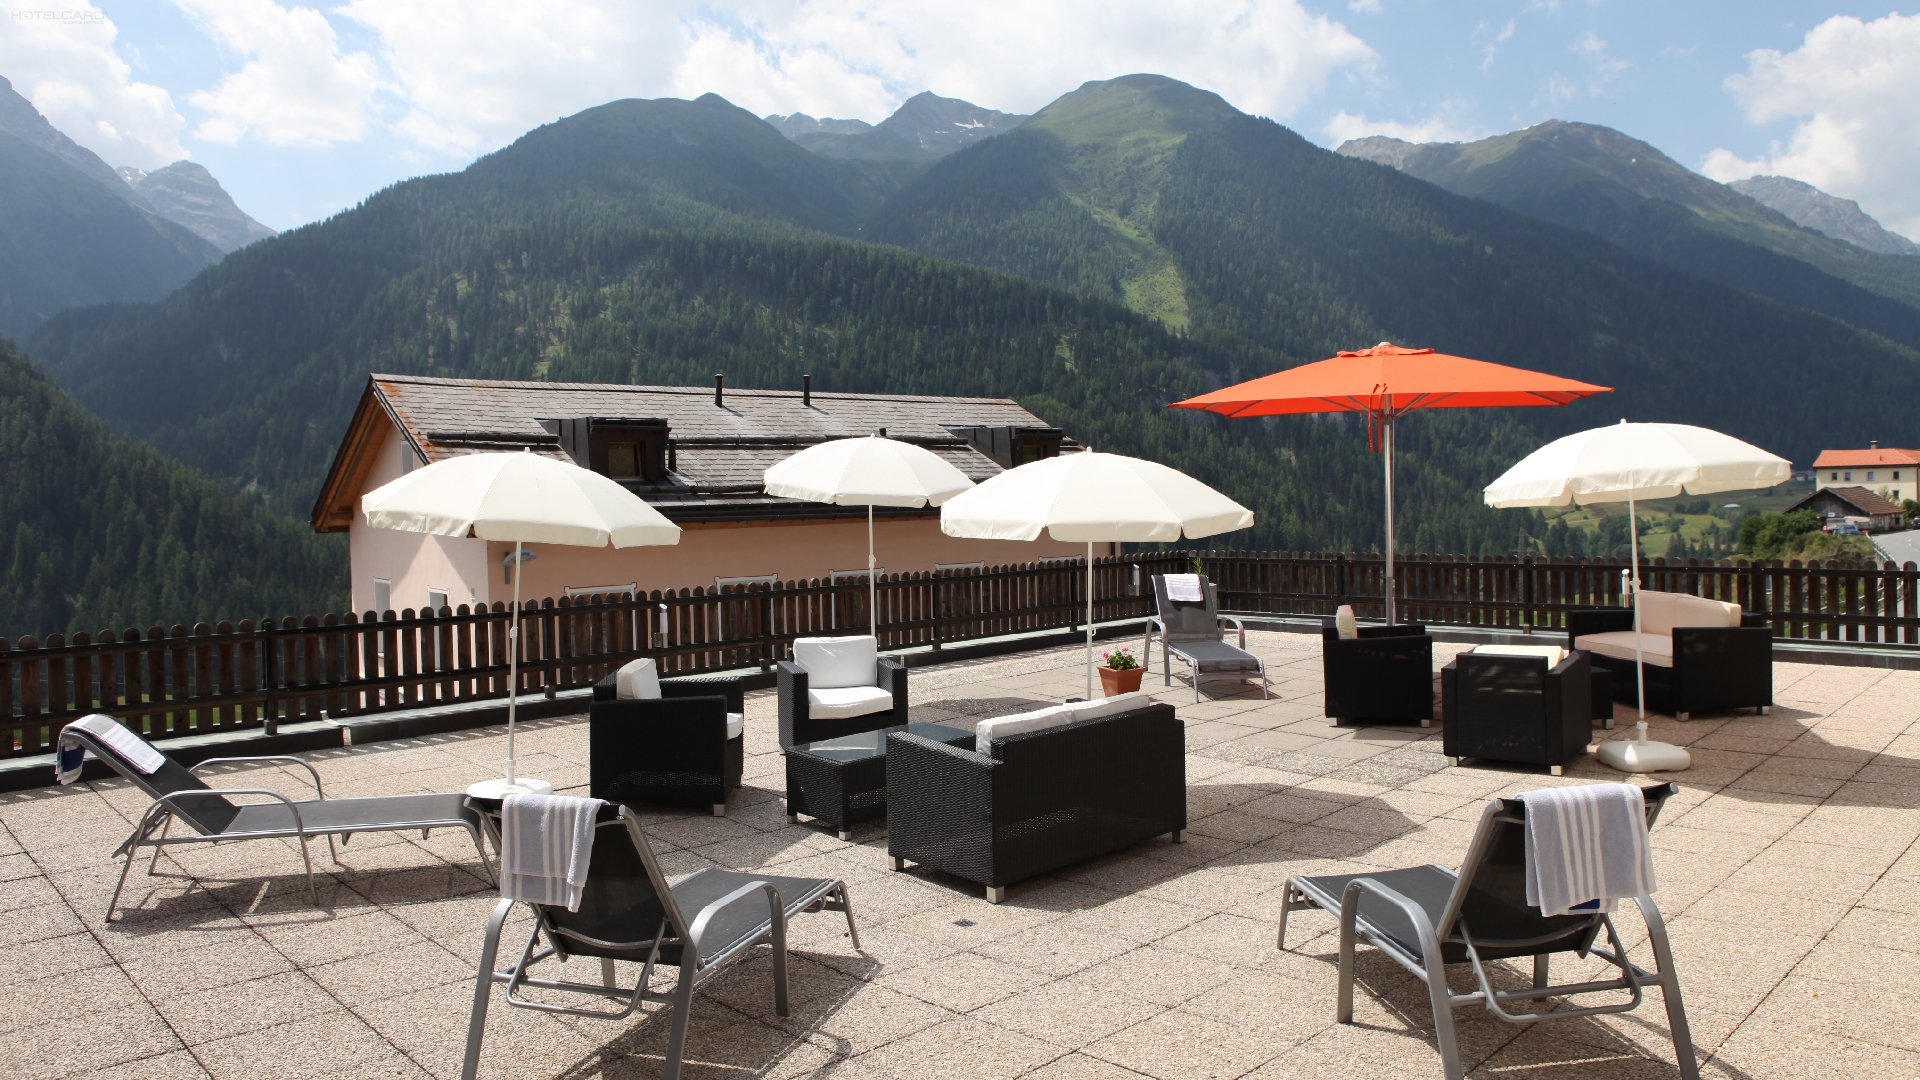 Schorta's Hotel Alvetern 2